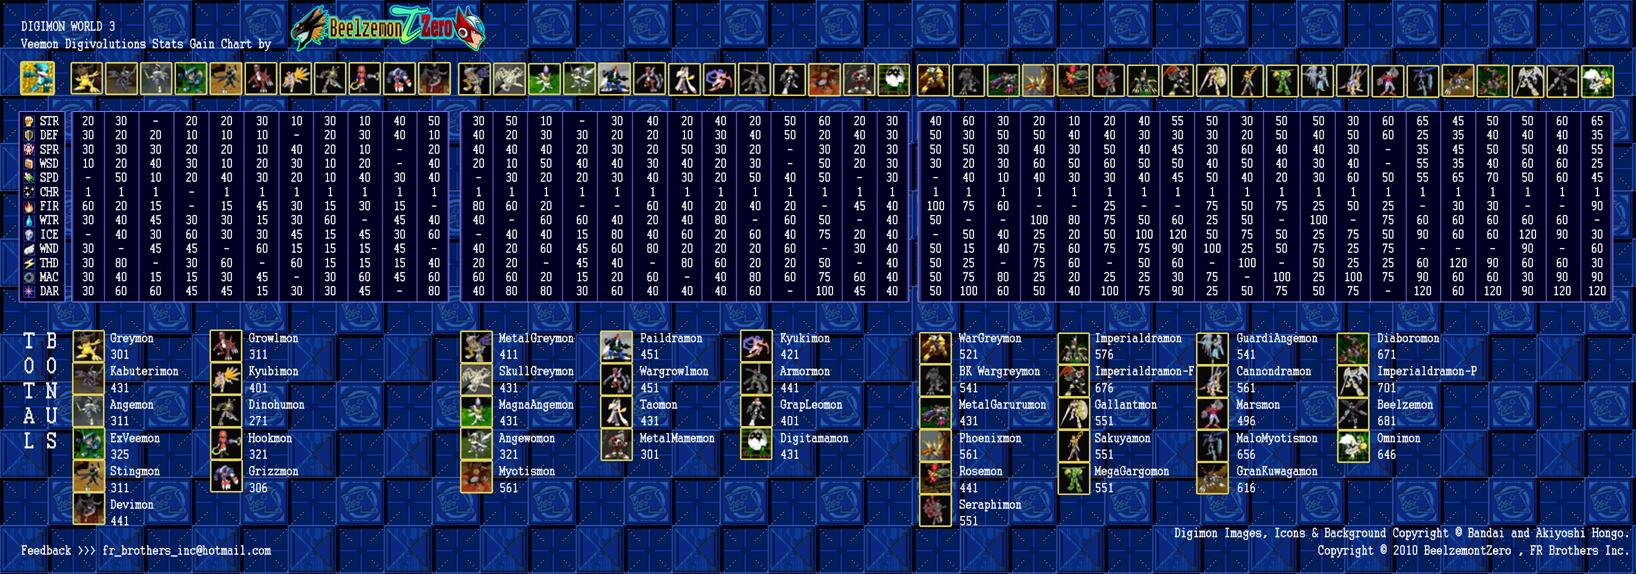 Digimon World 3 - DV Gain Charts by Digimon-FR on DeviantArt